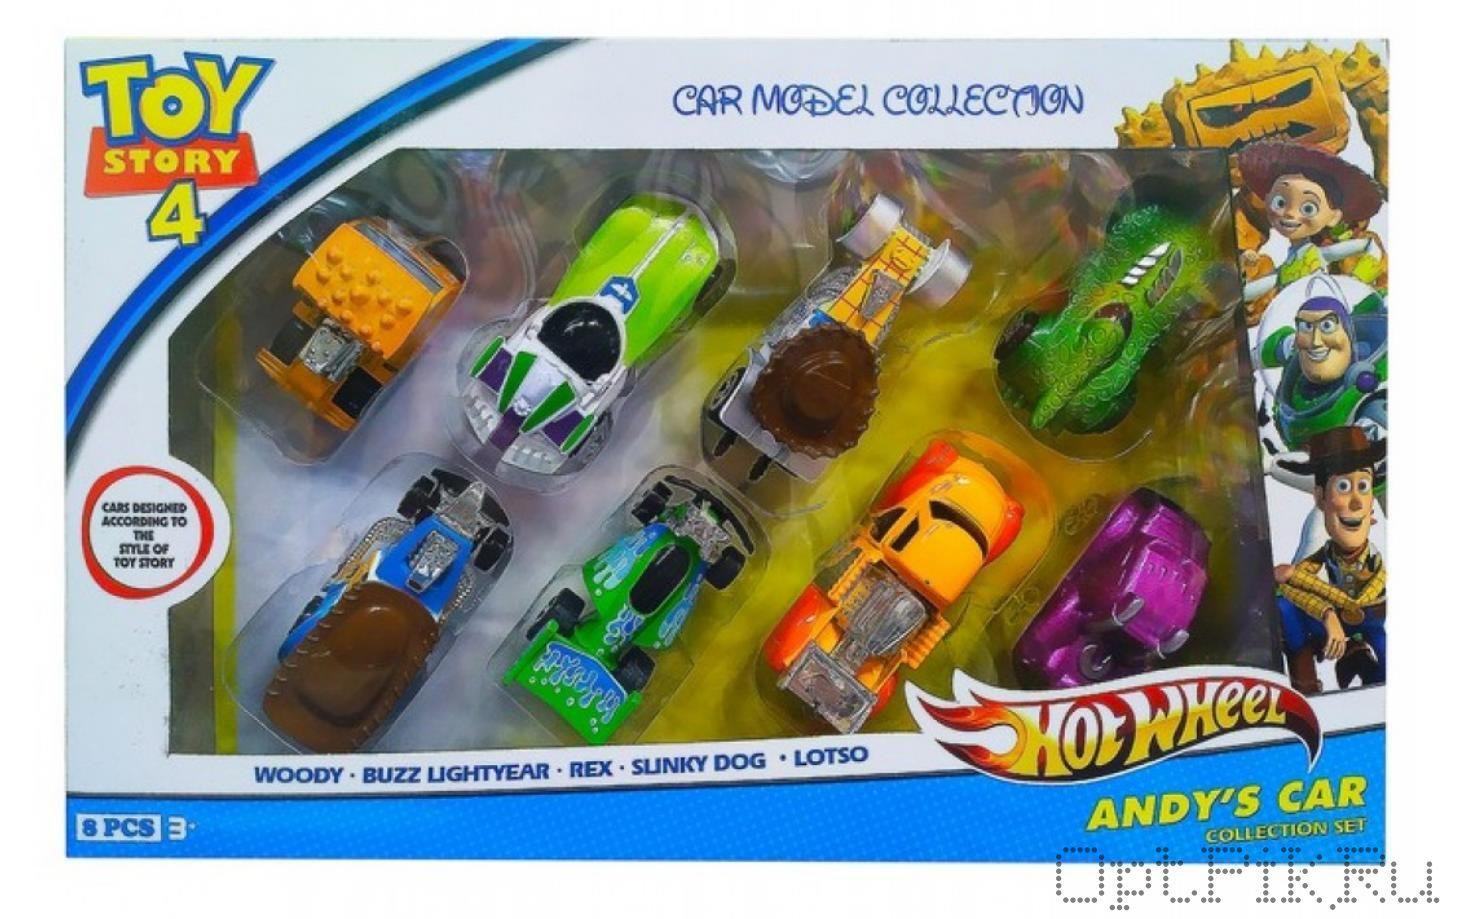 Набор из 8 машинок 7 см. История игрушек Hot Wheels (Хот Вилс)